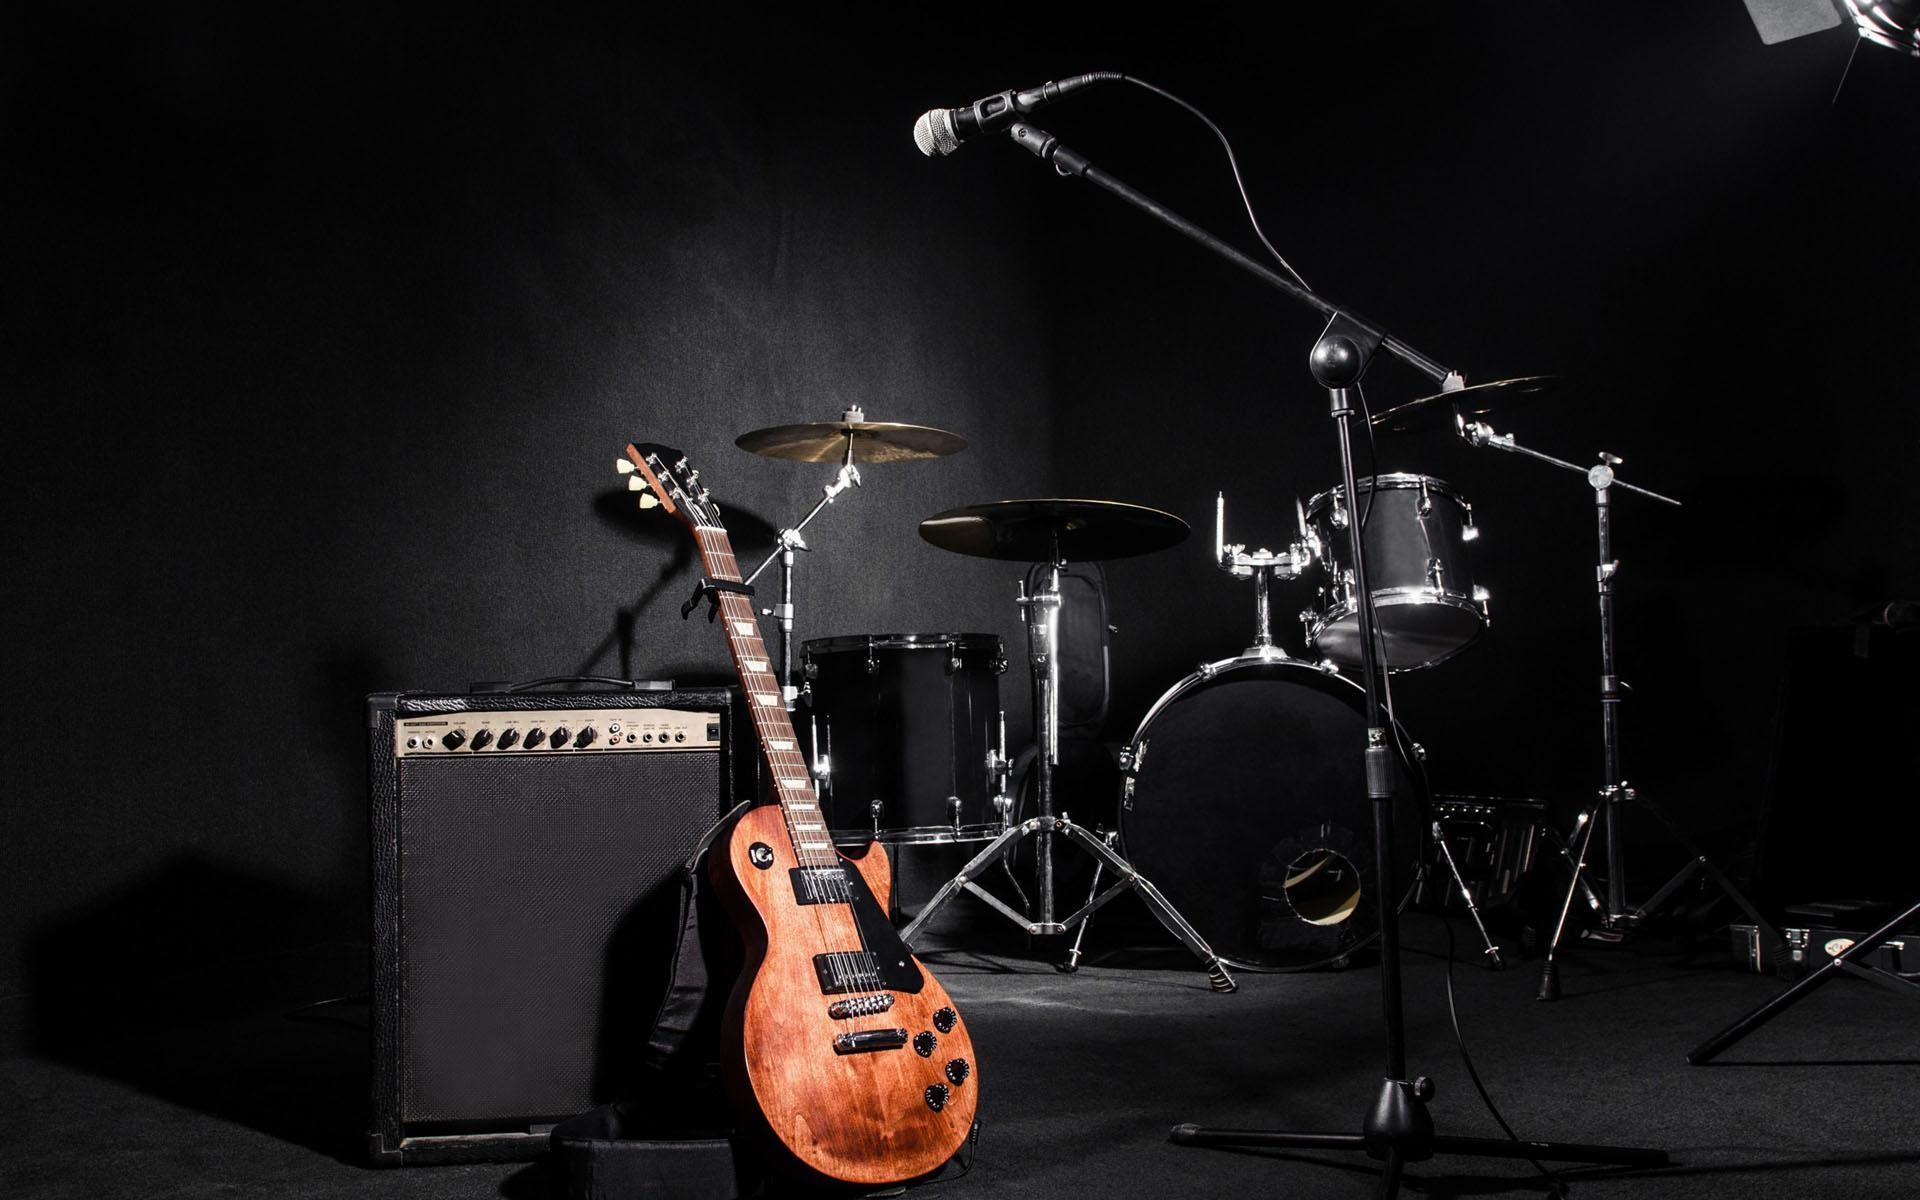 Guitar-Hd-Resolution-wallpaper-wp4007374